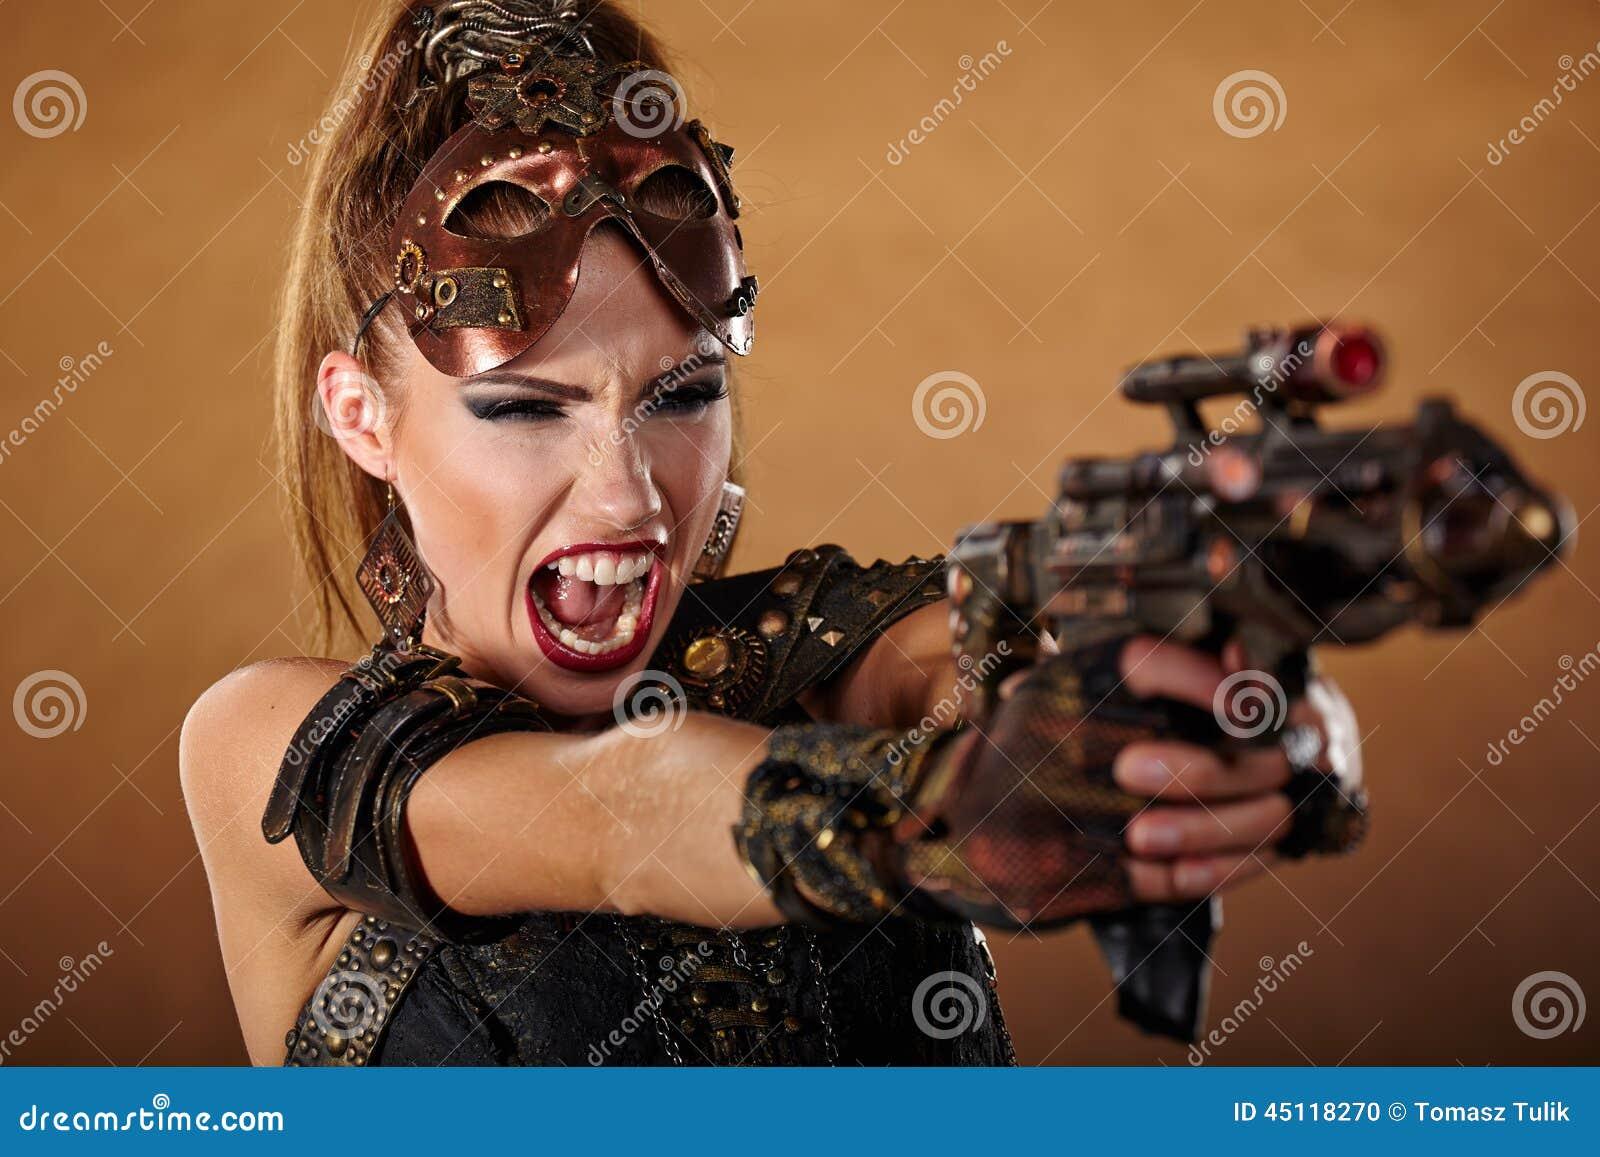 Steampunk woman. Fantasy fashion .